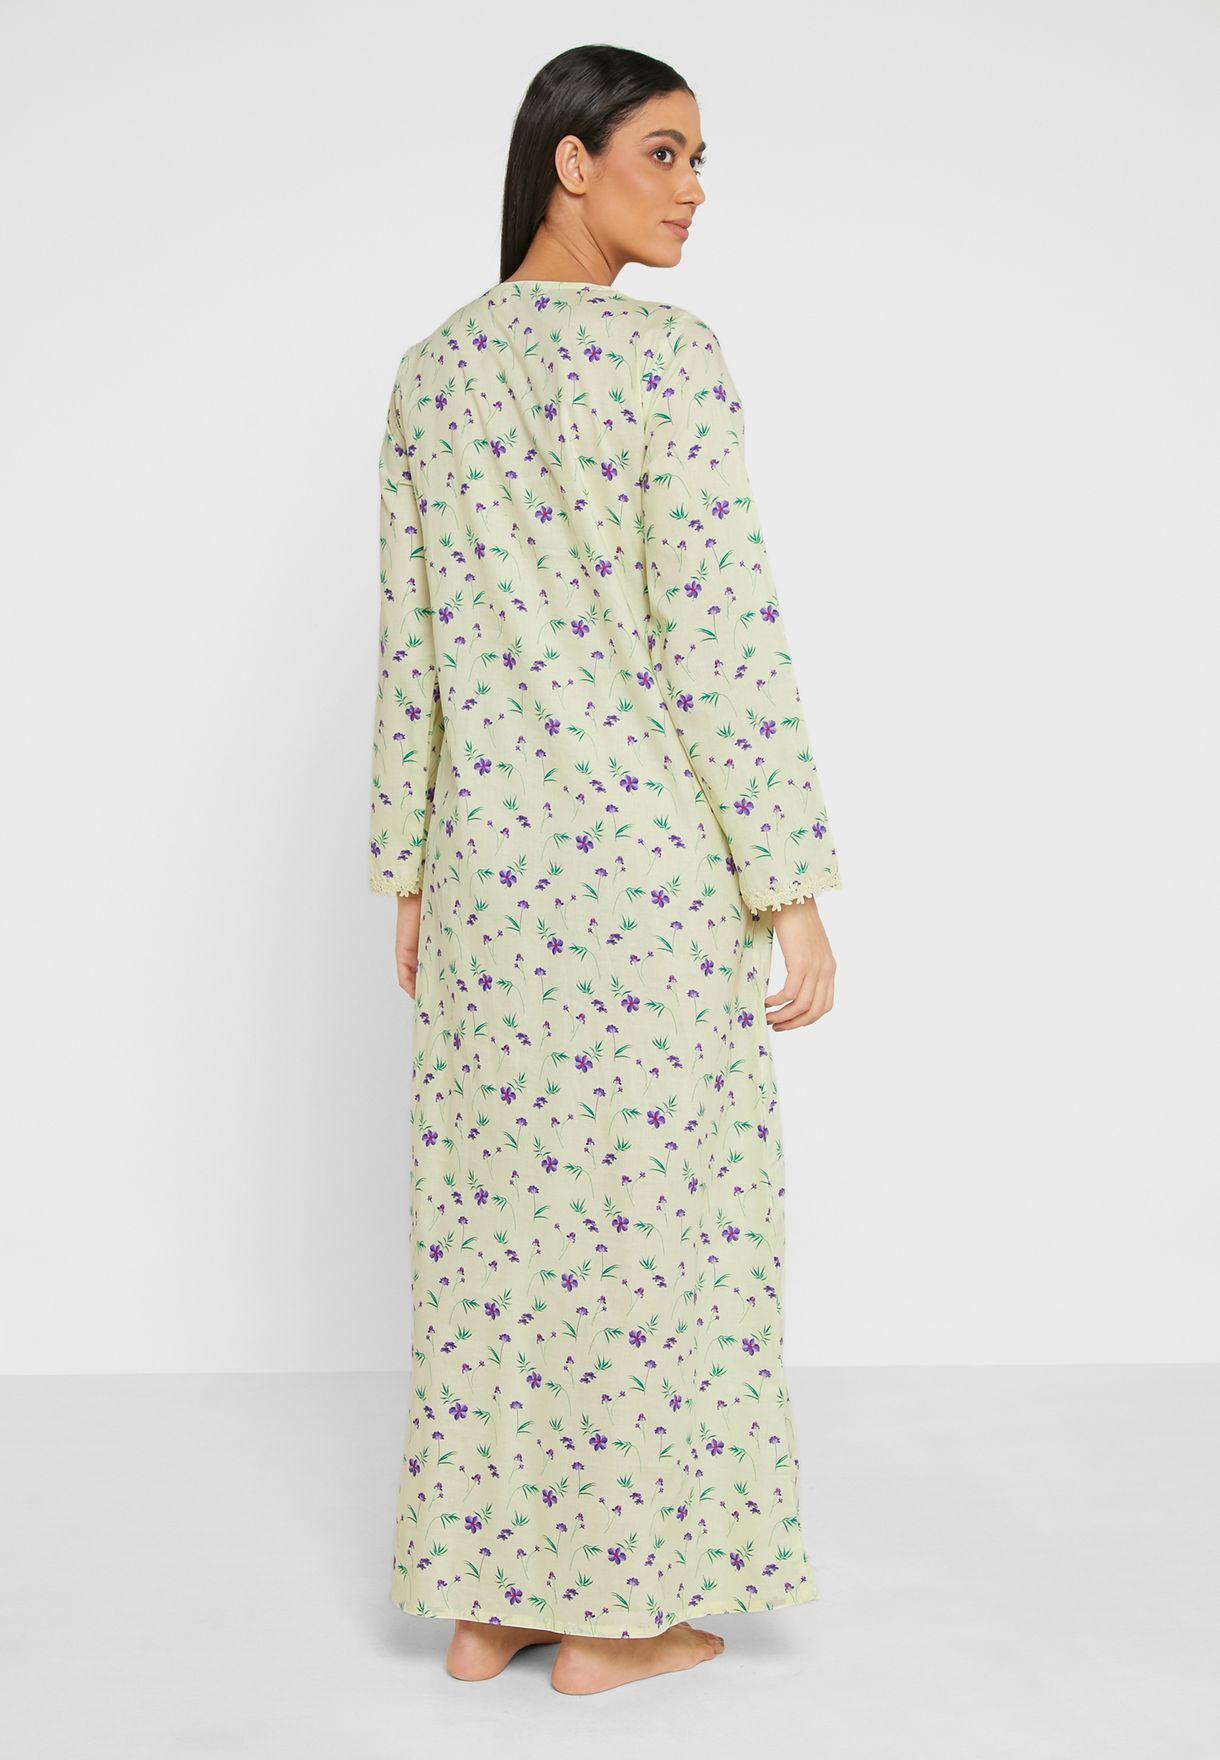 Full Sleeves Printed Cotton Nightdress